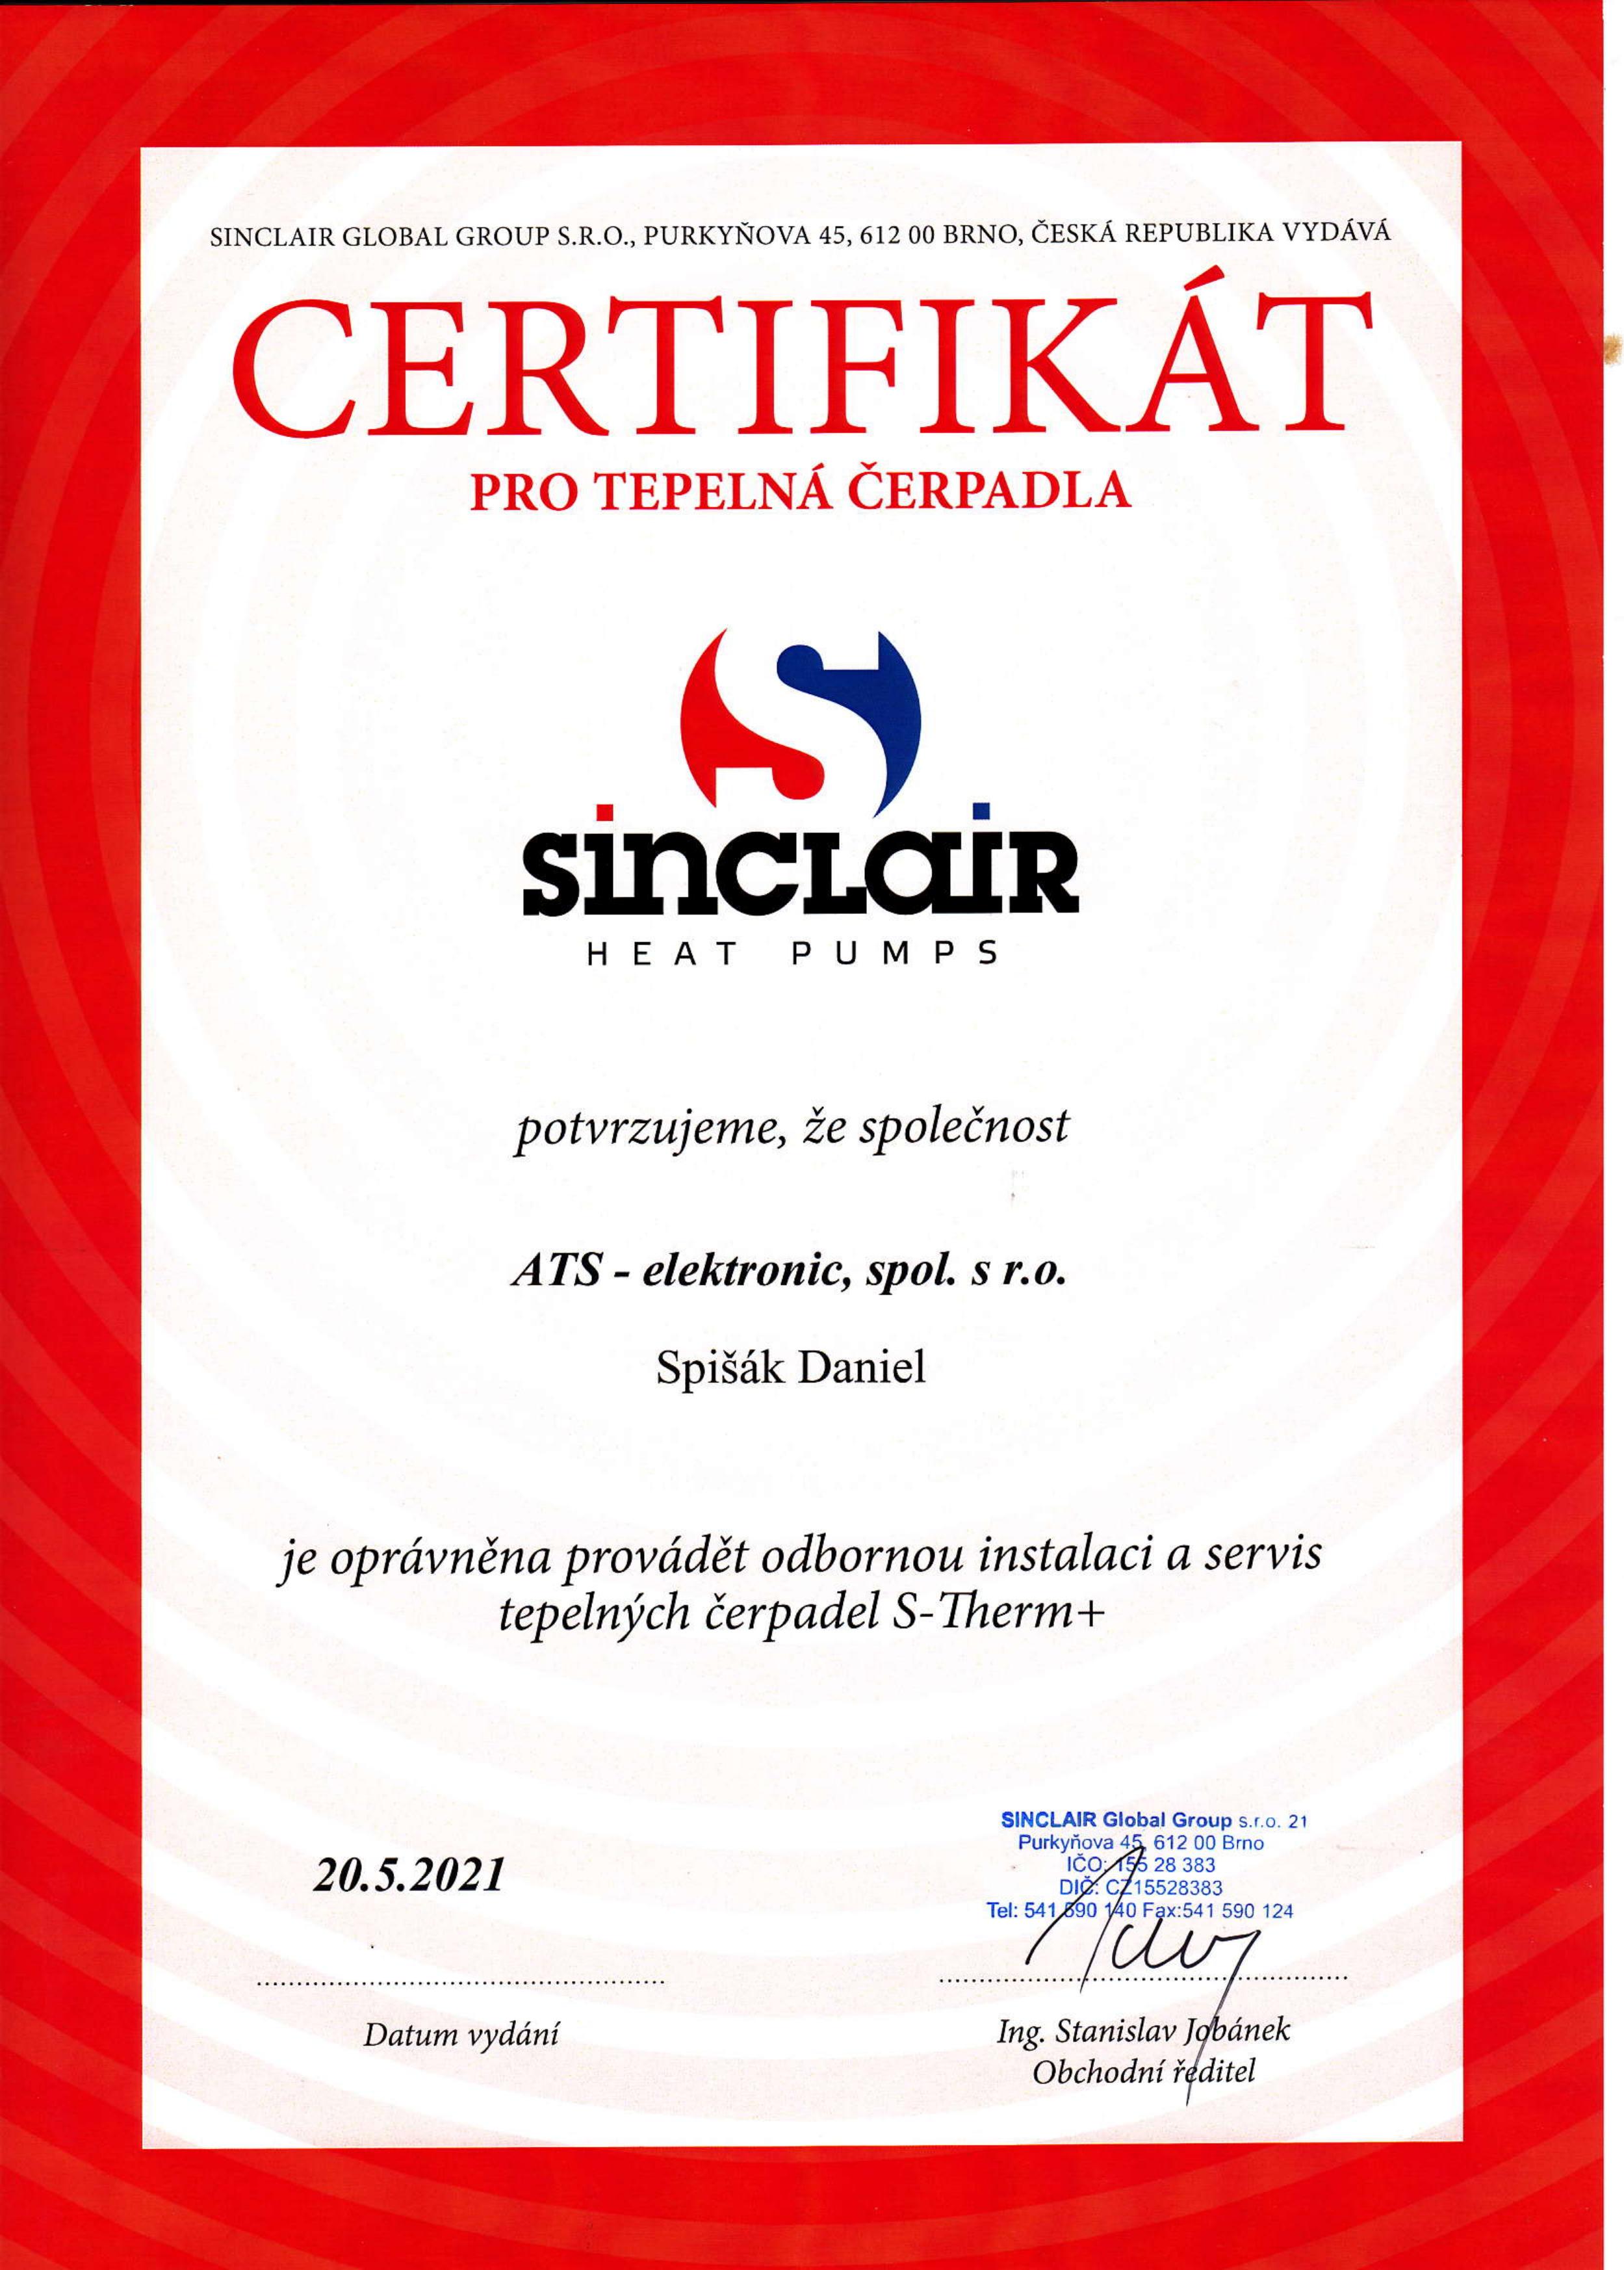 SINCLAIR certifikát montáž S-Therm+